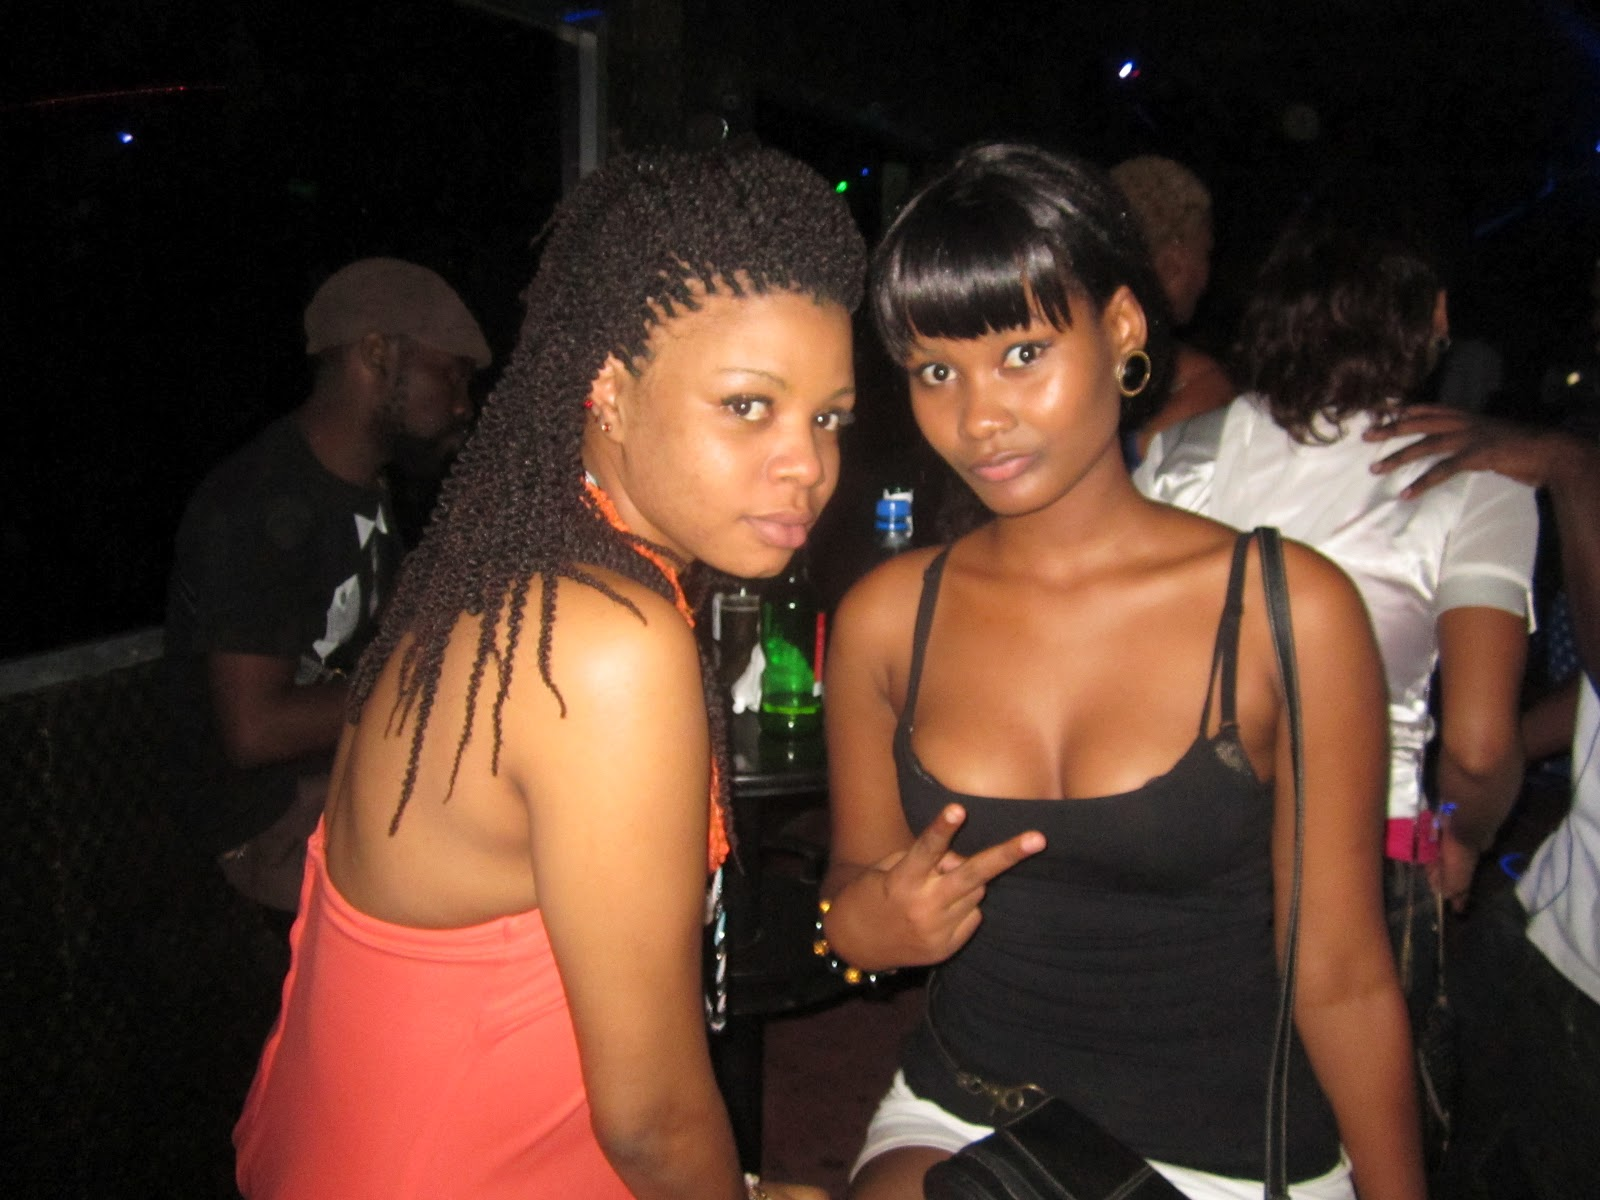 Escort girls in Choma